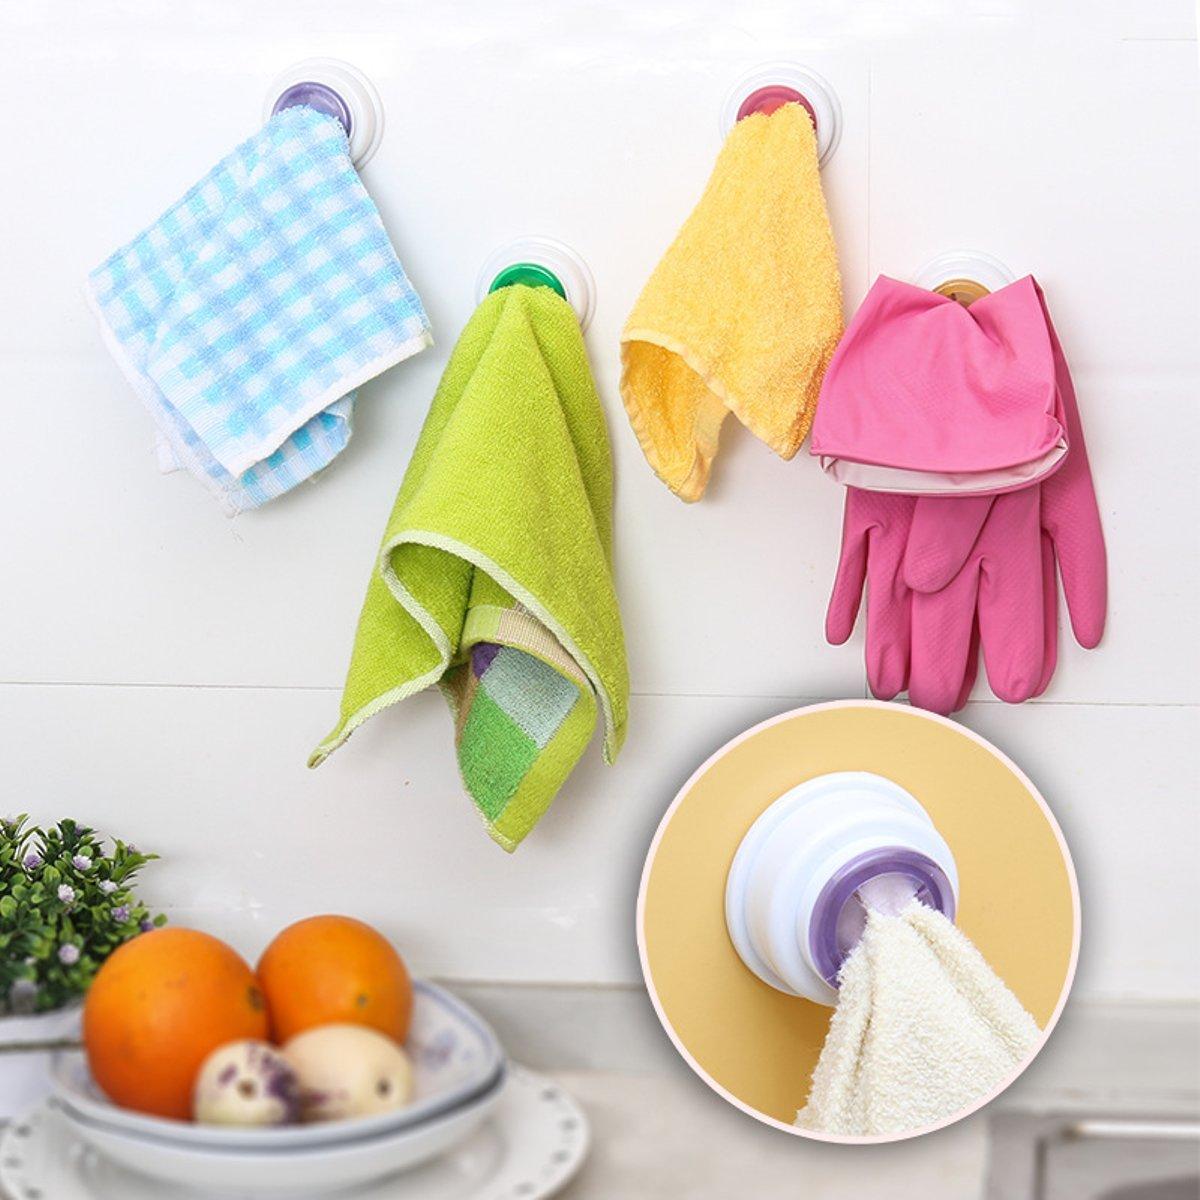 Tacoli Towel Holder Adhesive-2PCS Wash Cloth Clip Holder Clip Dishclout Storage Rack Bath Room Storage Hand Towel Rack- Kitchen Towel Hooks